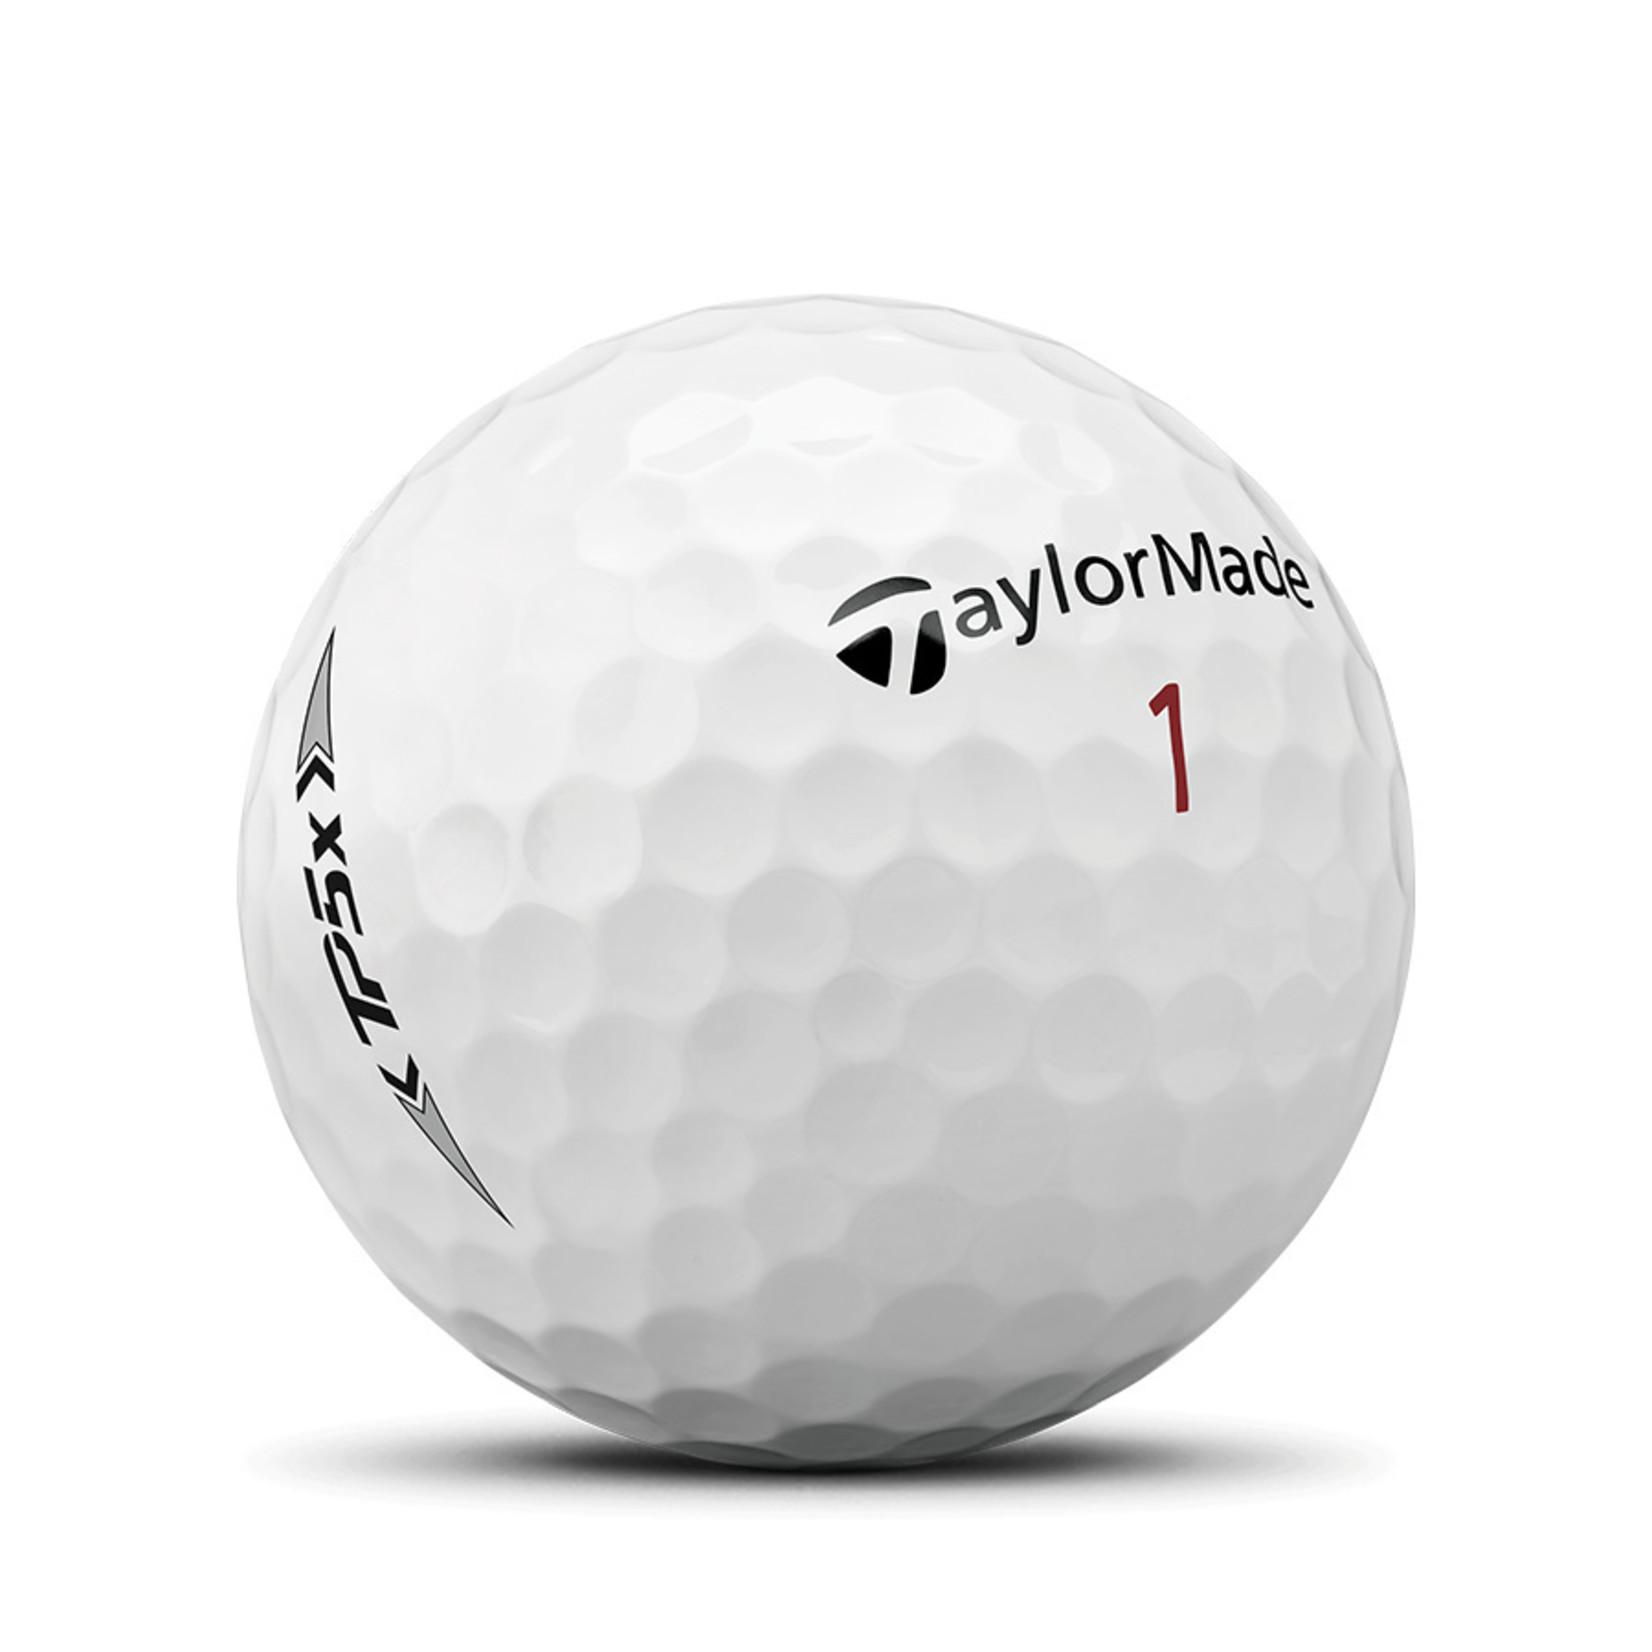 TaylorMade 2021 TP5x - Dozen